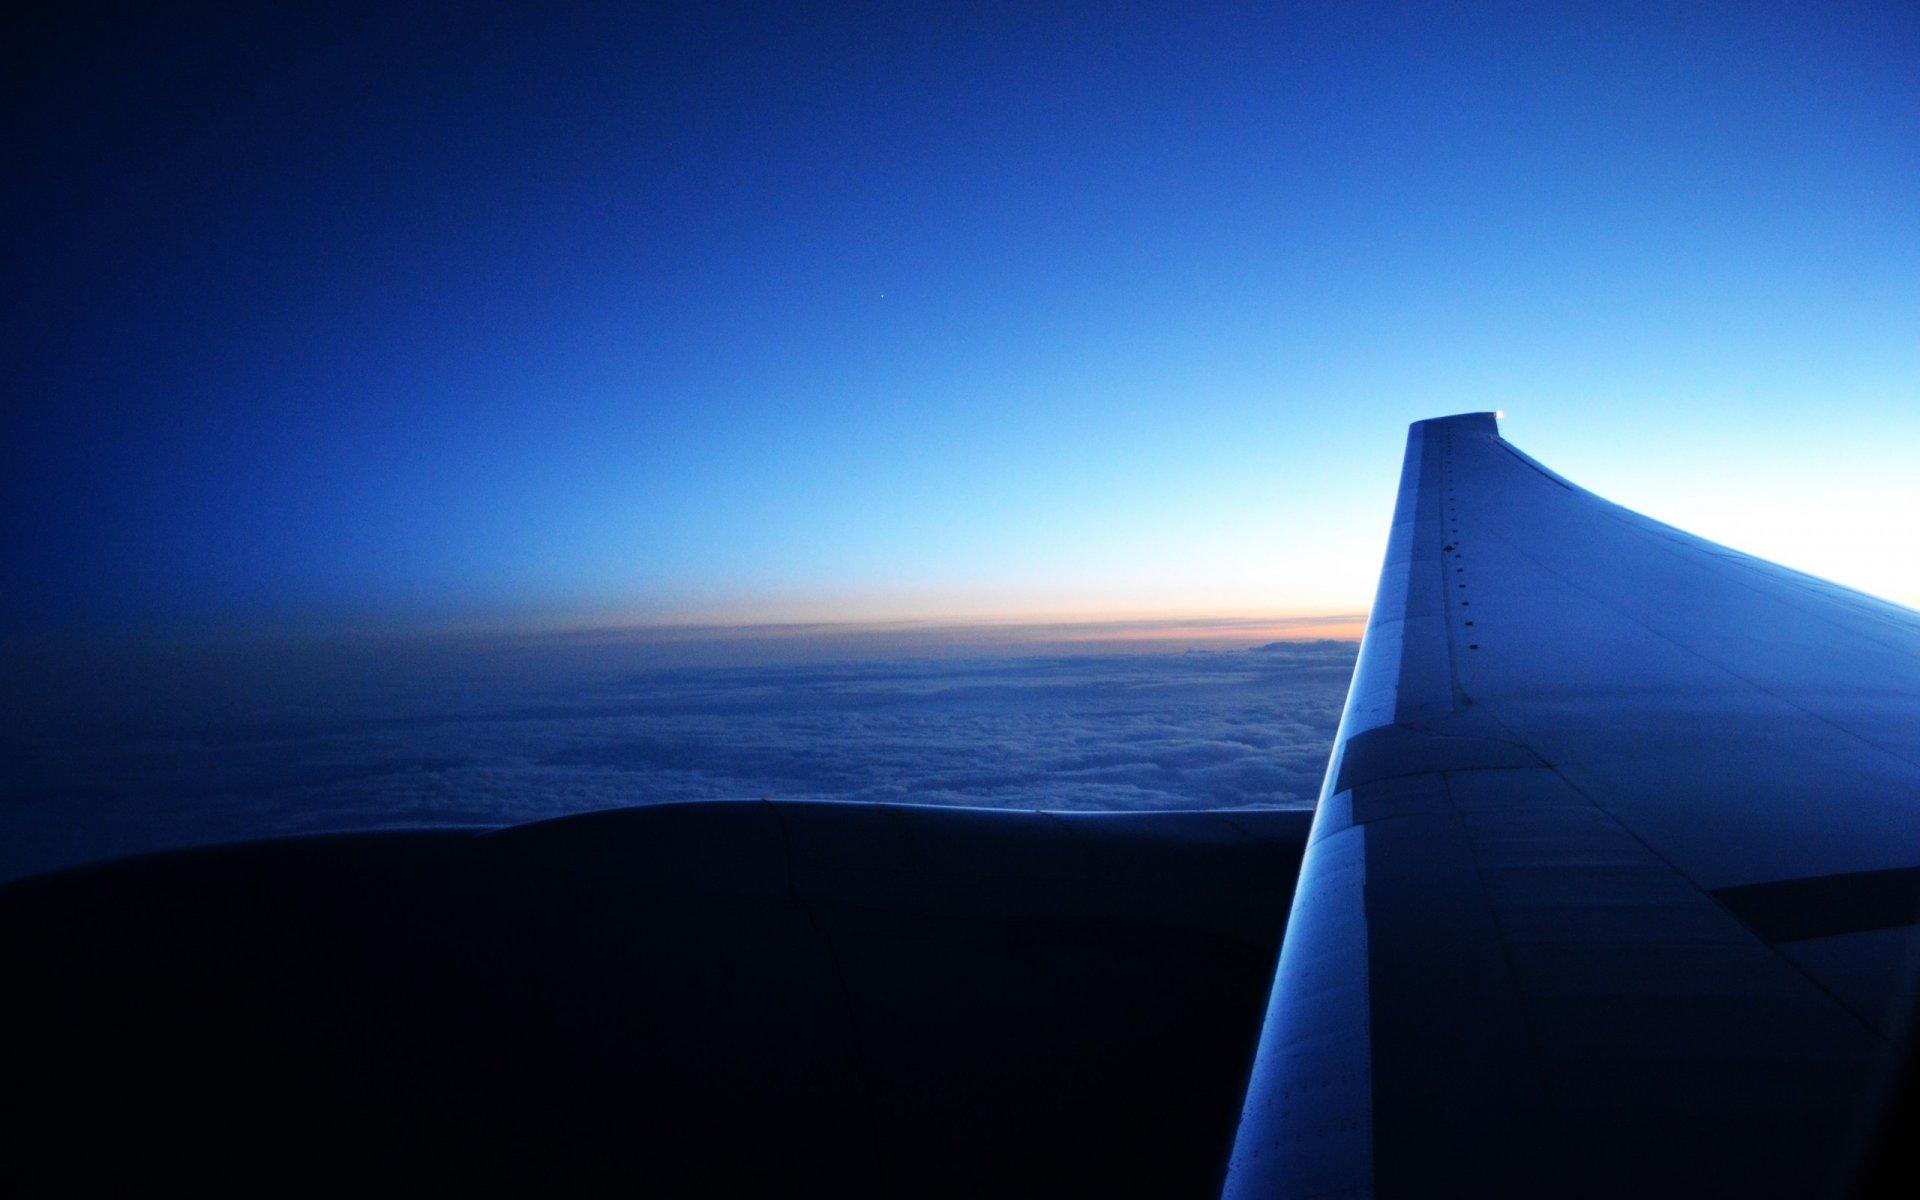 Обои 777, авиалайнер, philippines, боинг, 300, boeing, пассажирский. Авиация foto 15